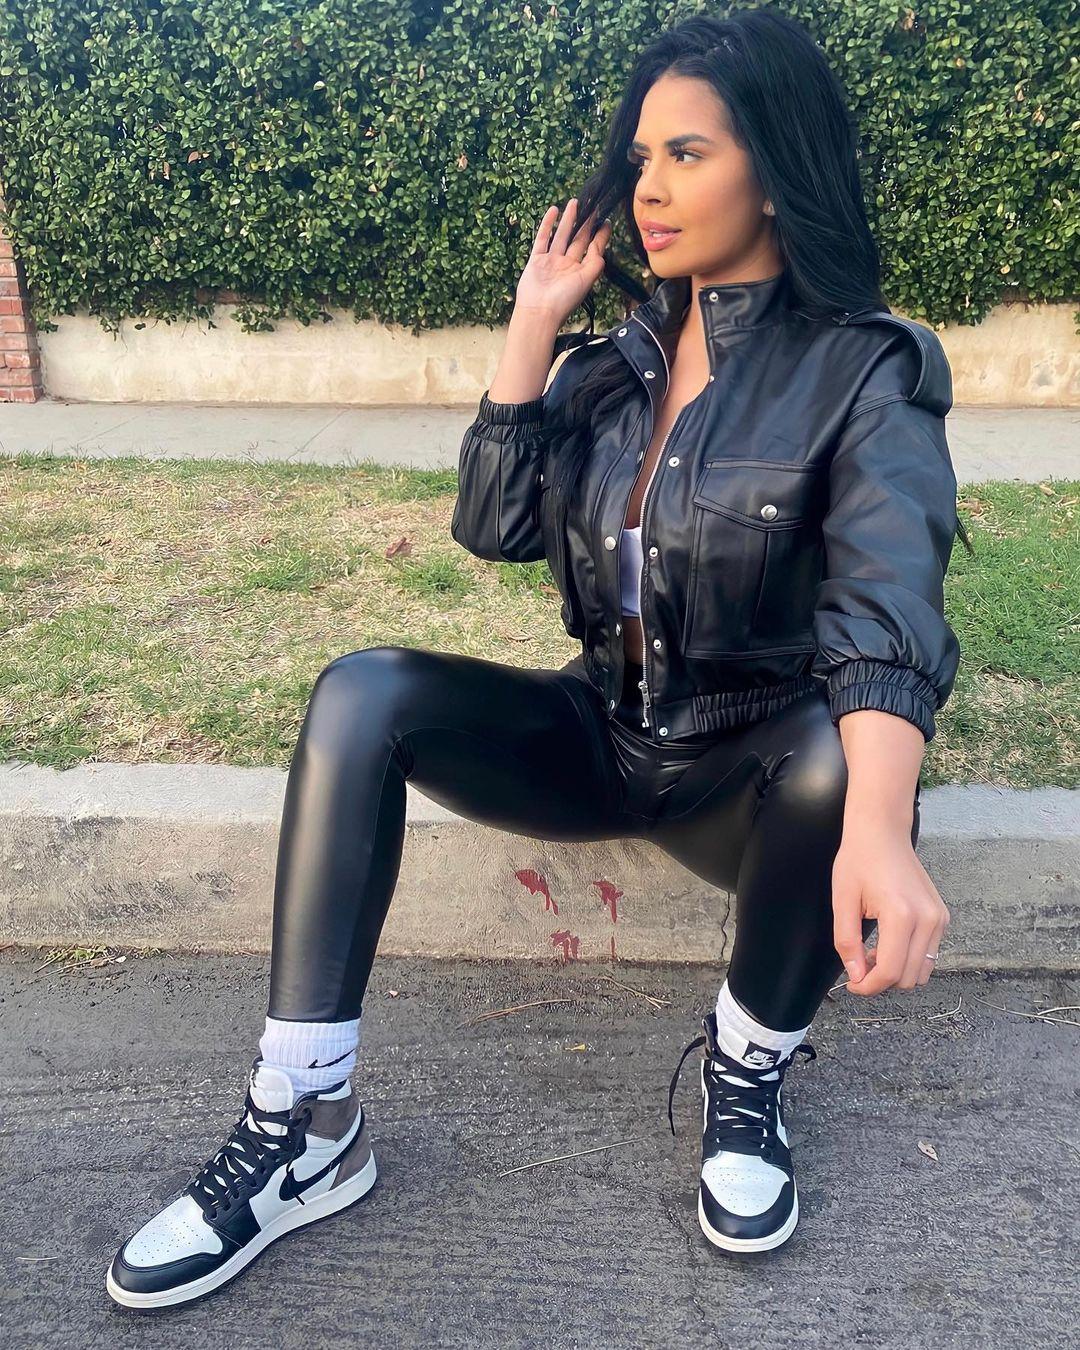 Nicole-Cruz-Wallpapers-Insta-Fit-Bio-8